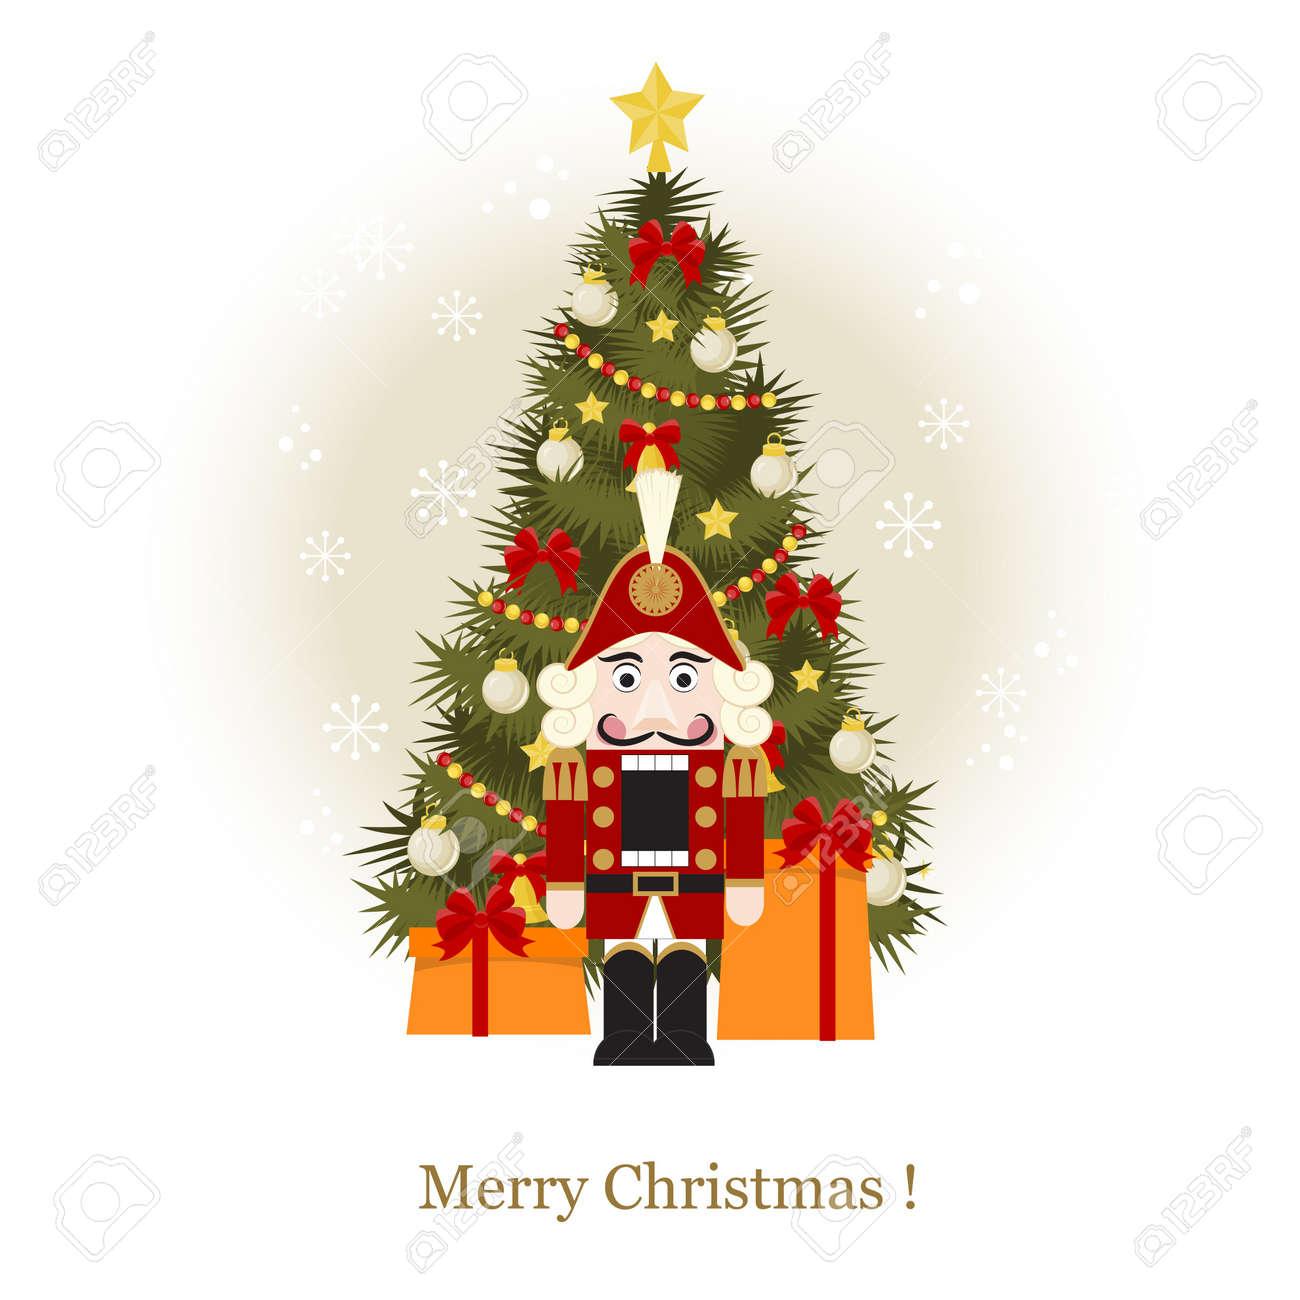 Nutcracker Christmas Tree Clipart.Christmas Greeting Card With Christmas Tree And Nutcracker